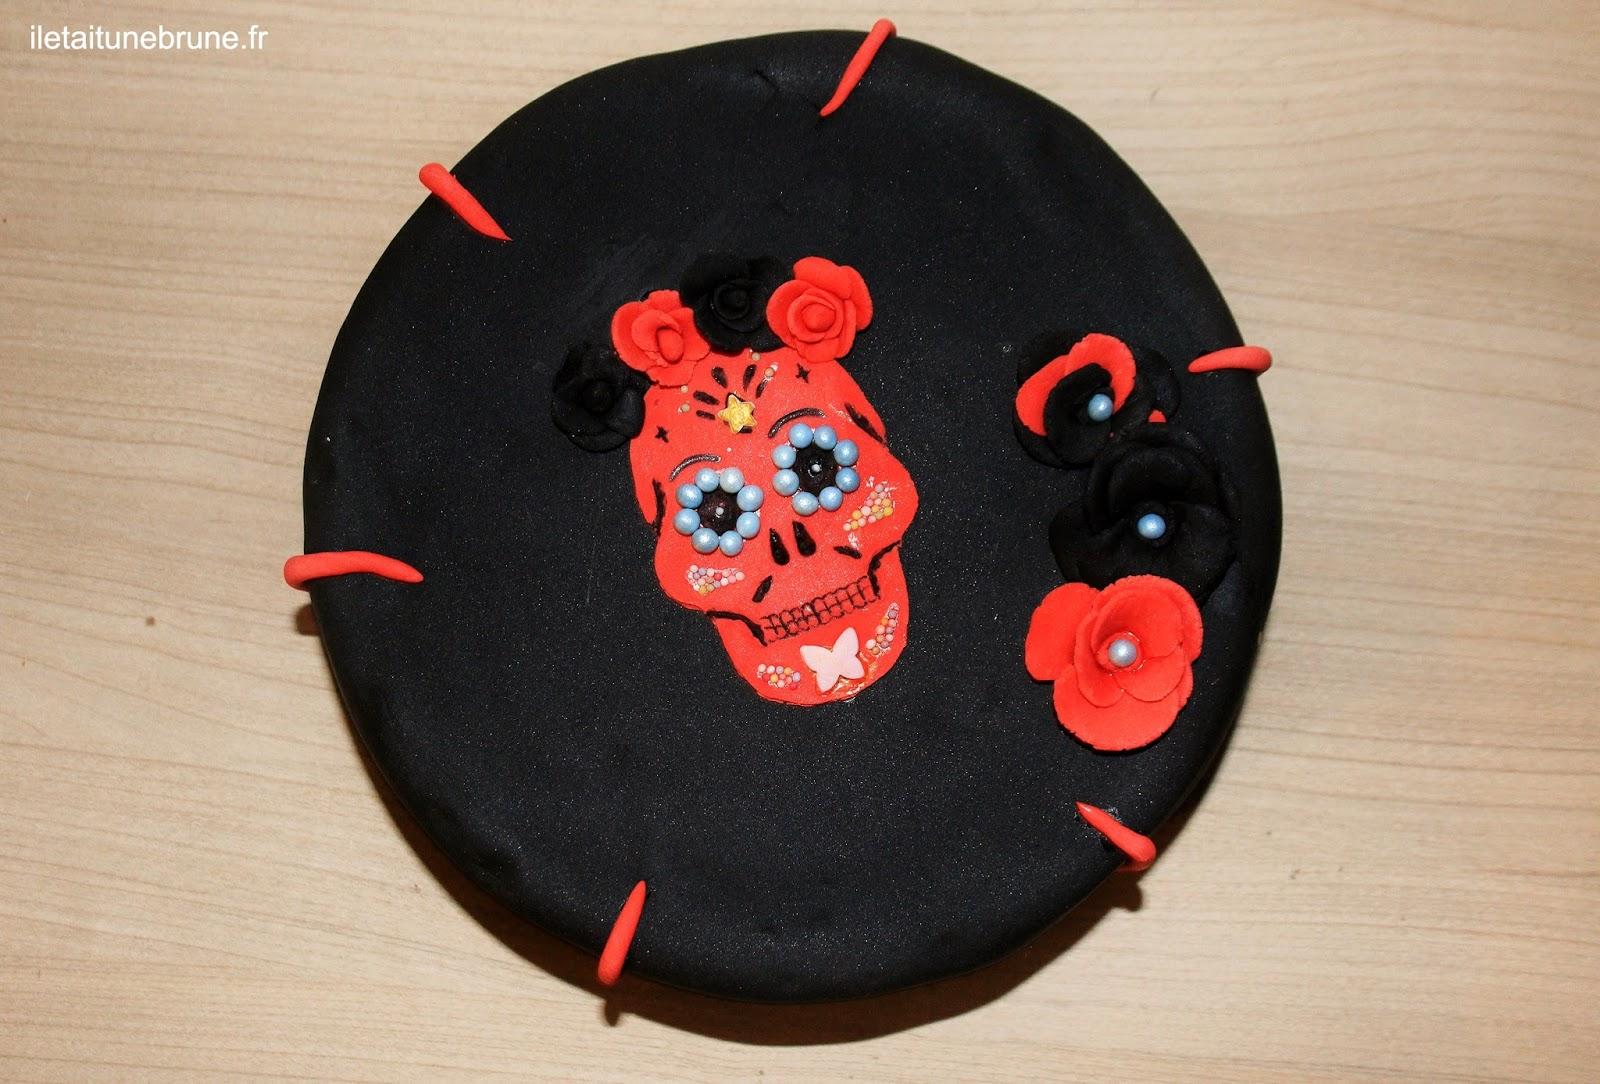 Recette Calavera cake